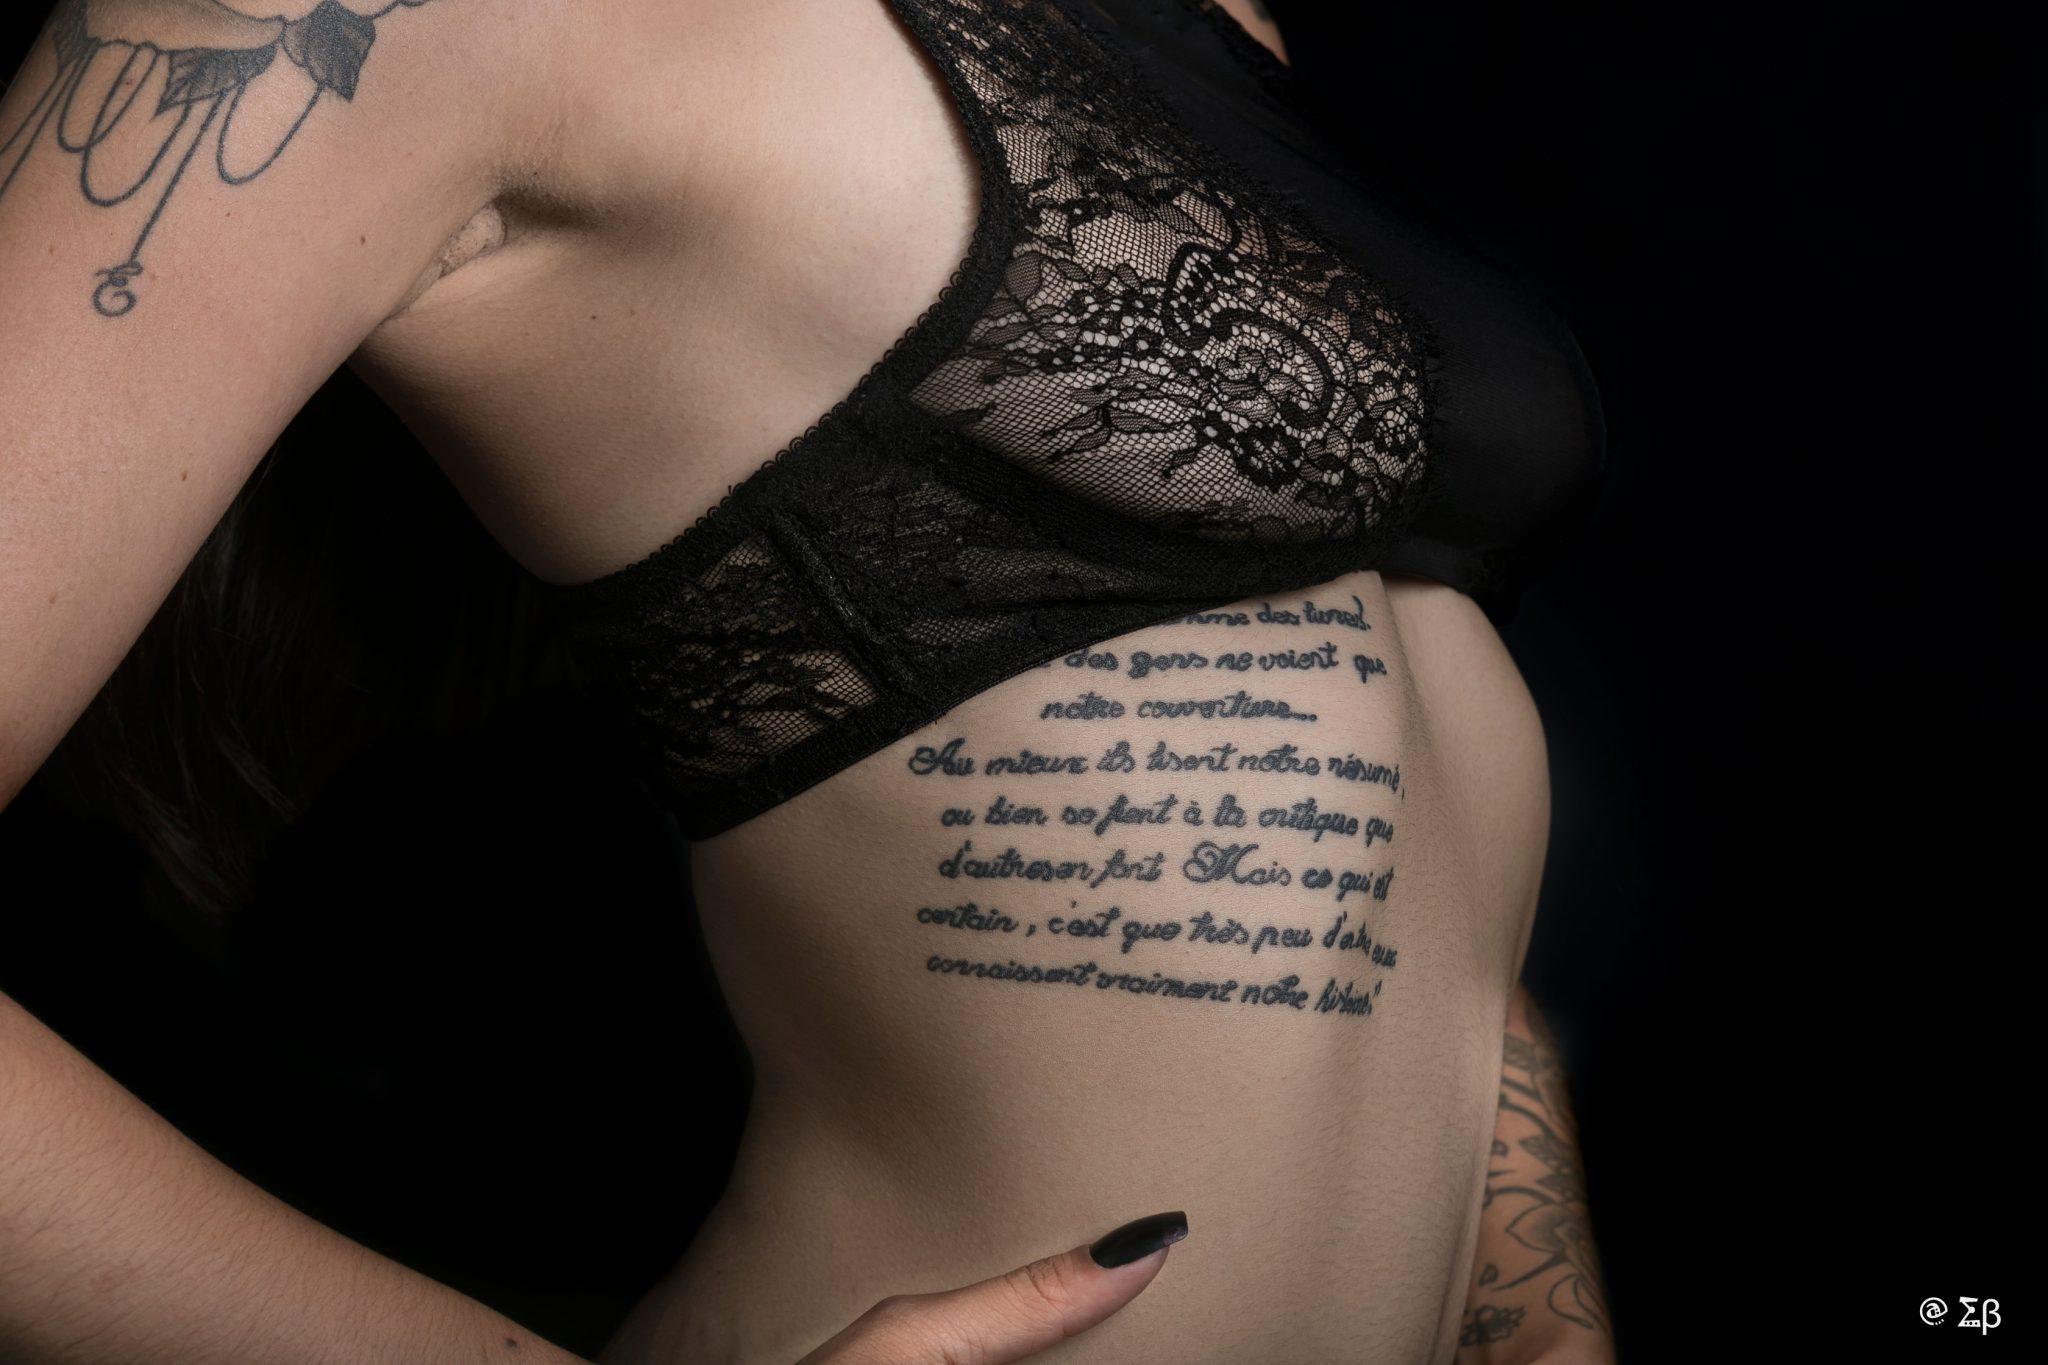 boudoir-lingerie-woman-girly-studio-eucleia-photo-saint-maximin-aix-provence-tropez-maxime-sainte-france-south-of-sanary